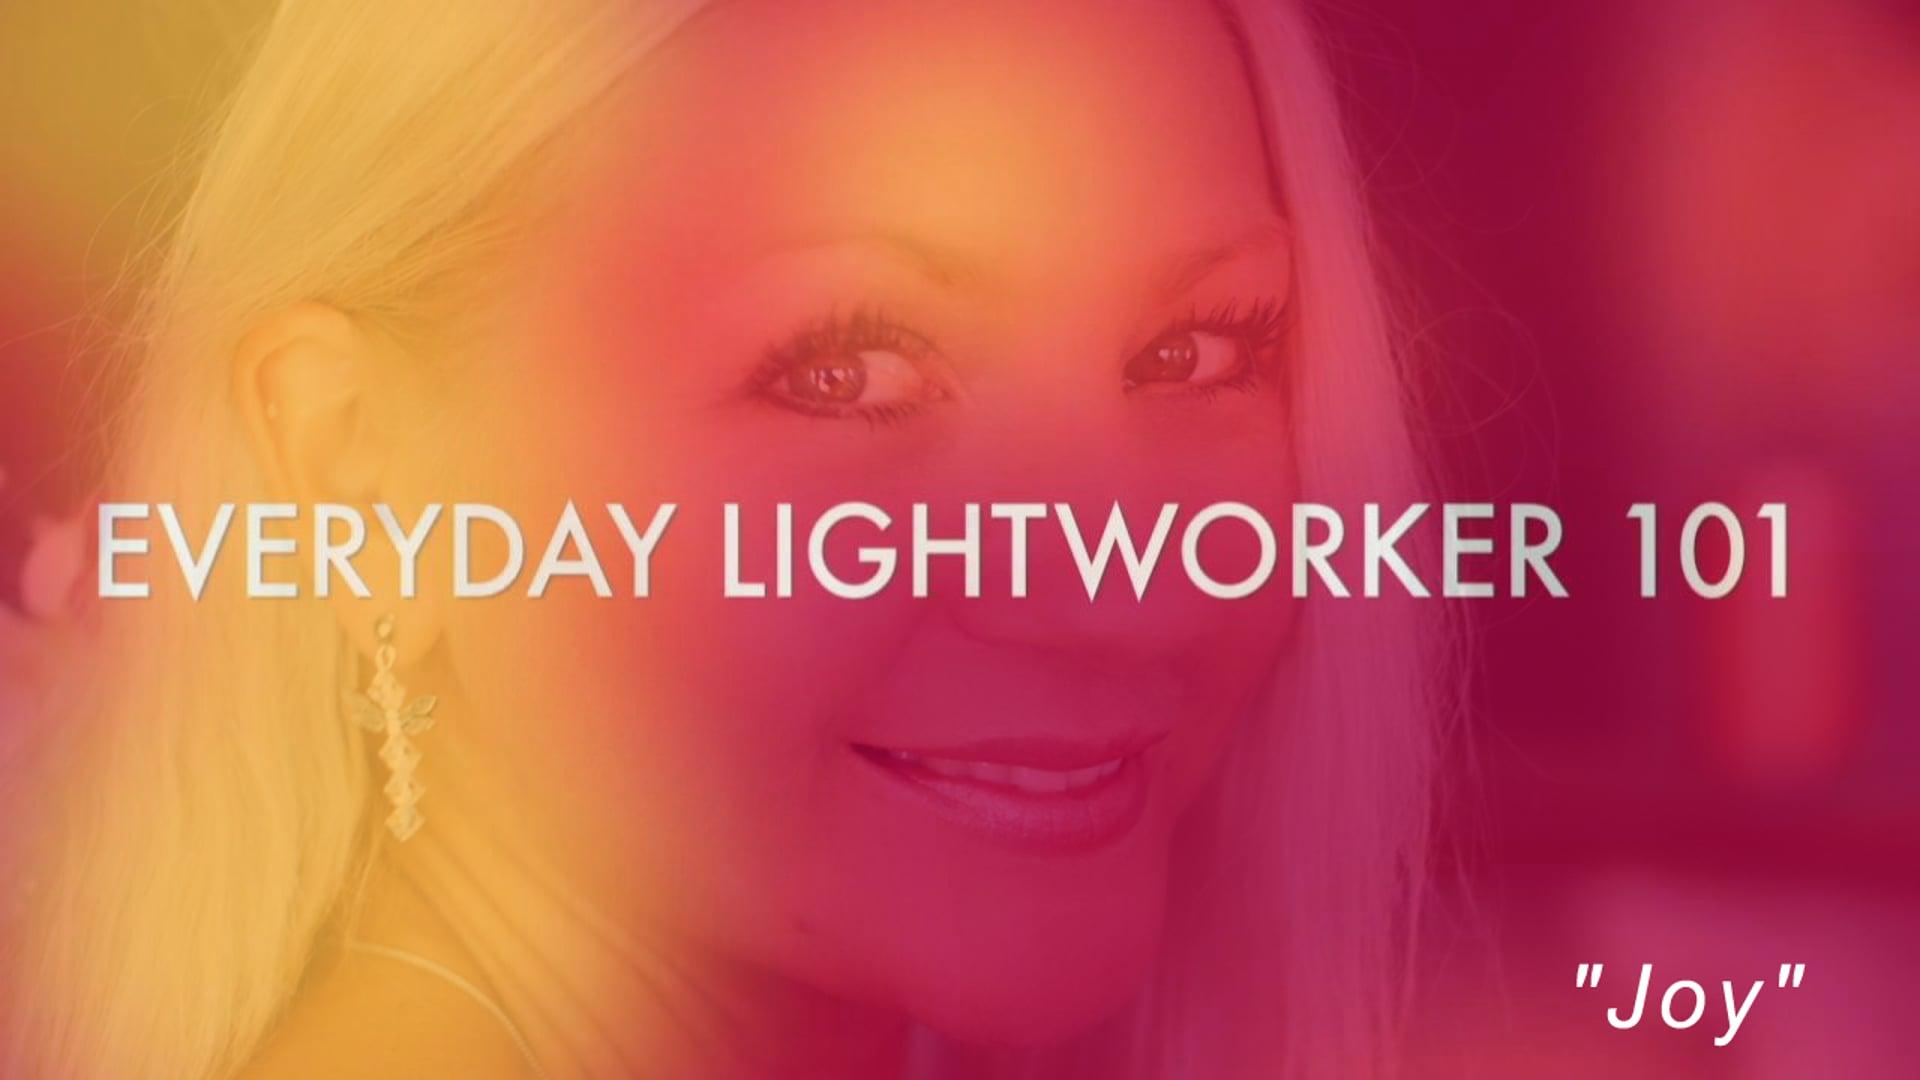 Everyday Lightworker 101: Joy